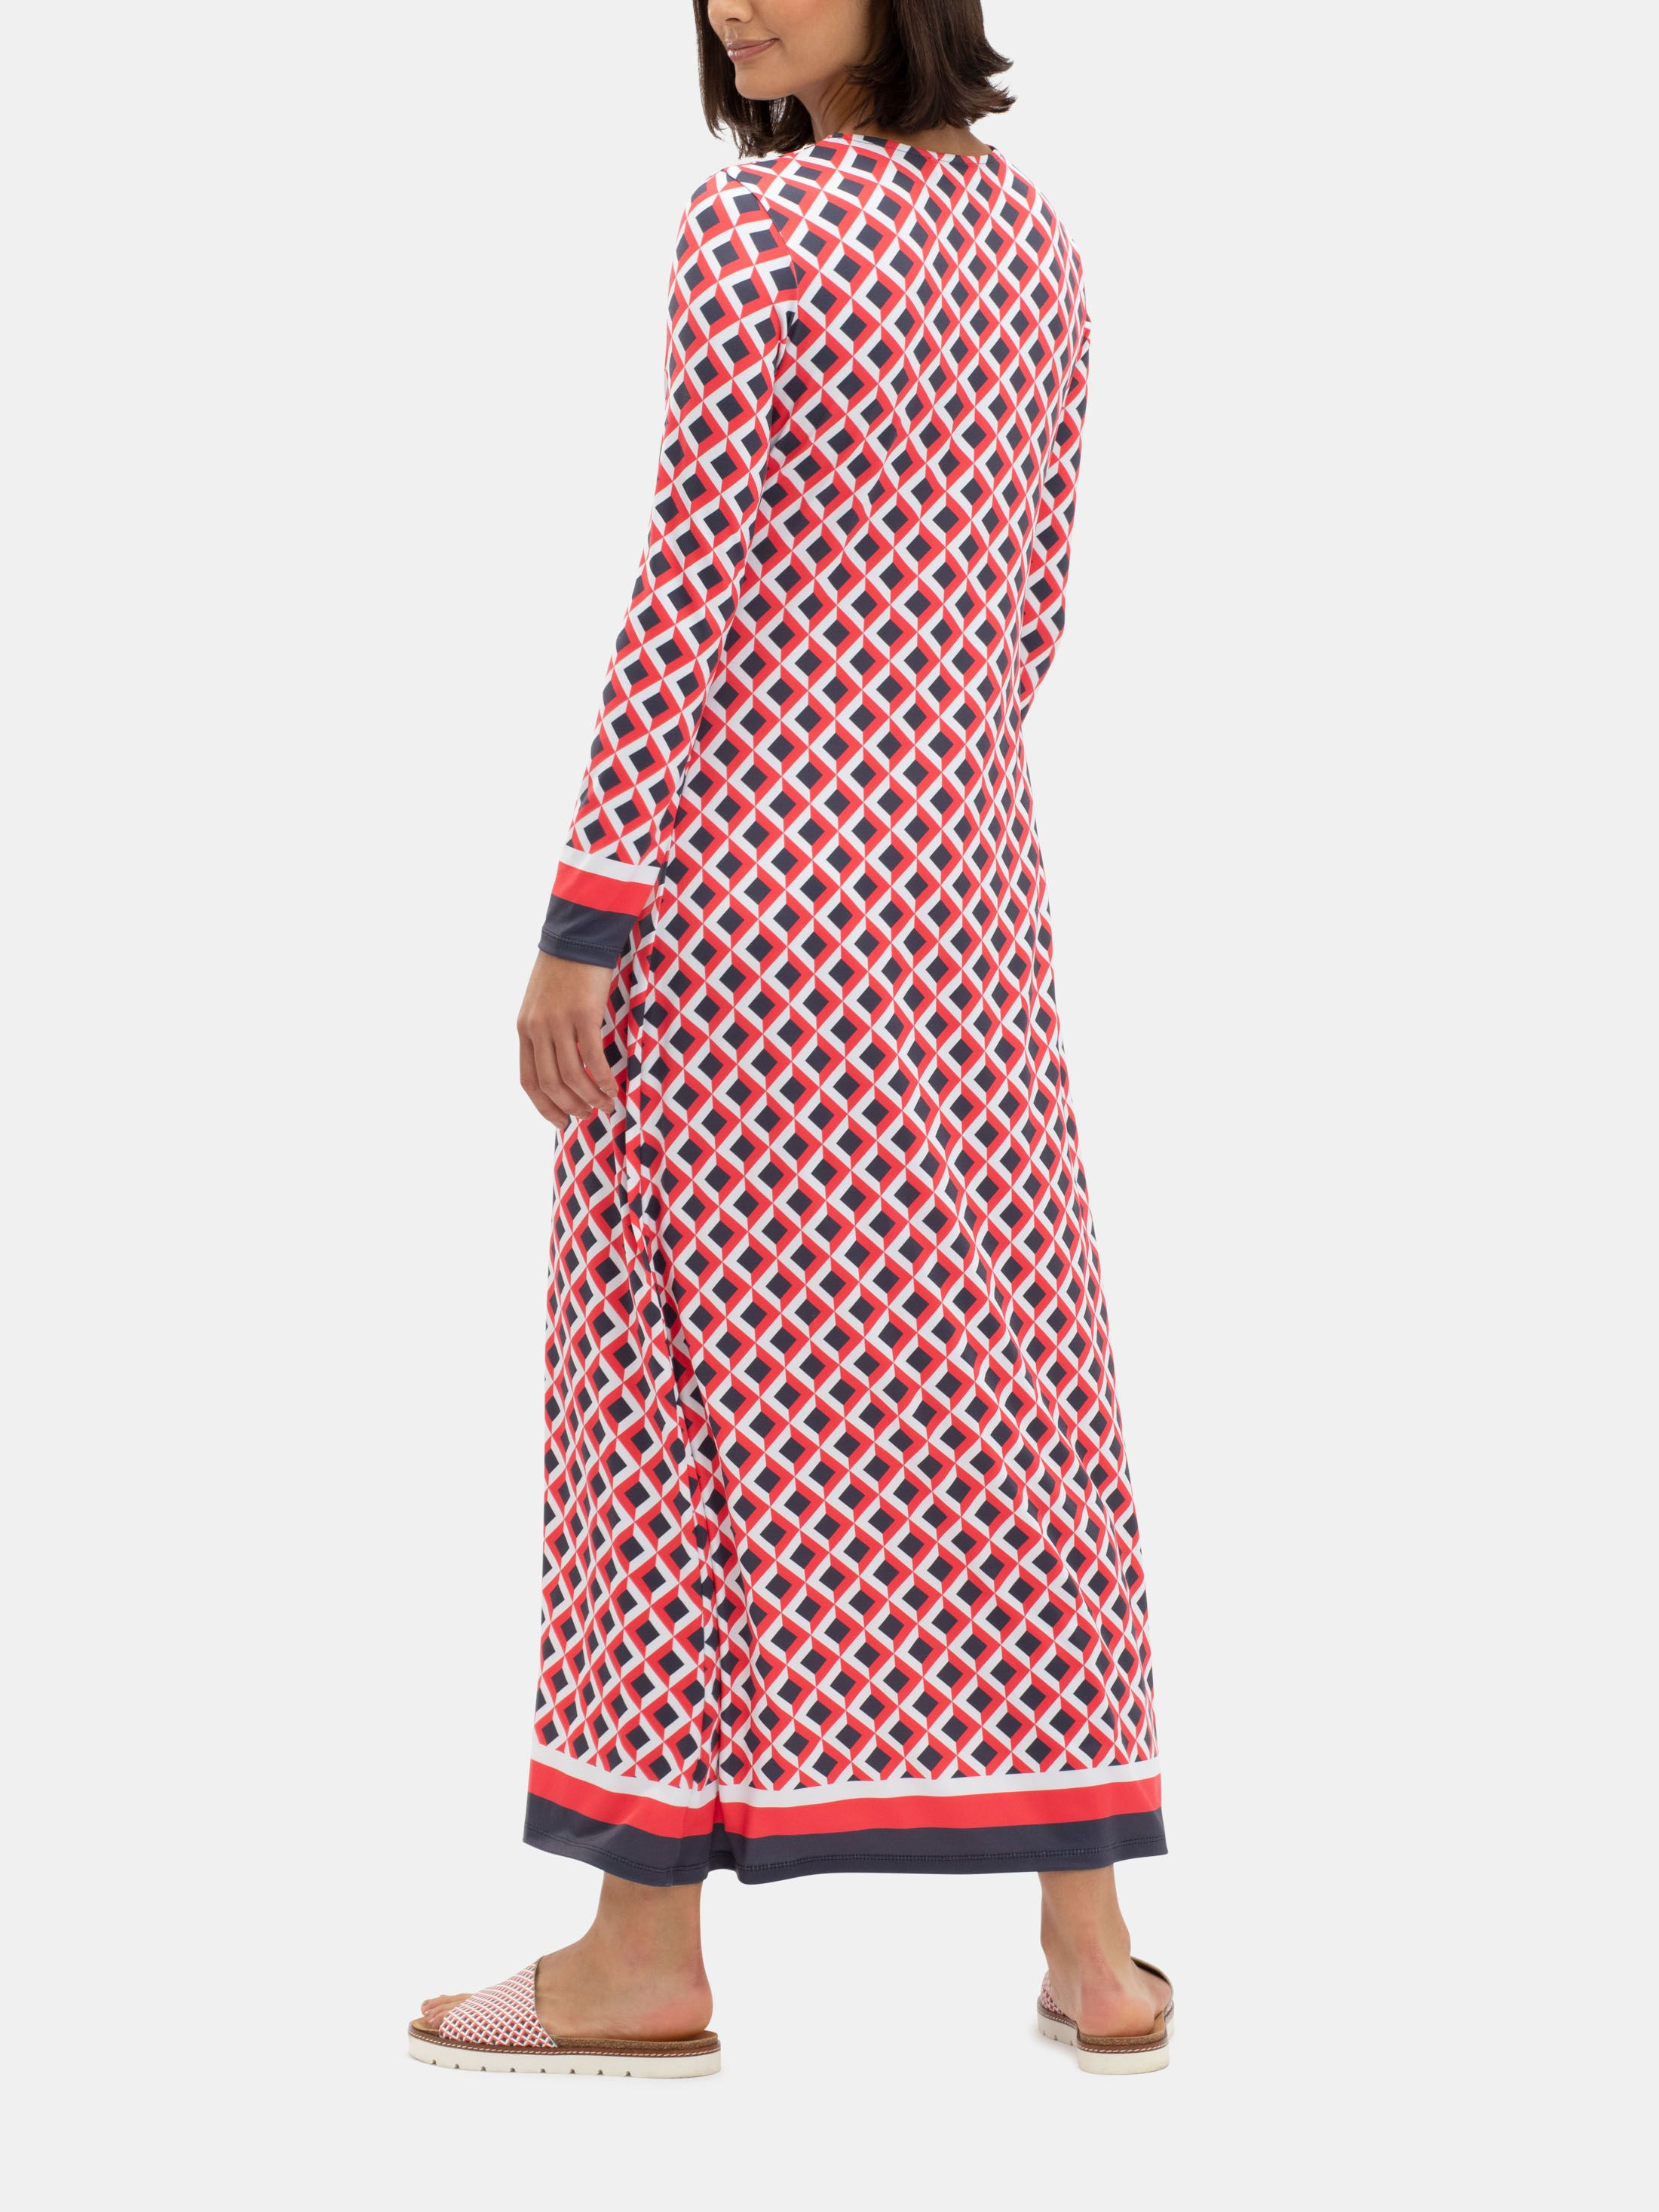 custom designed dress